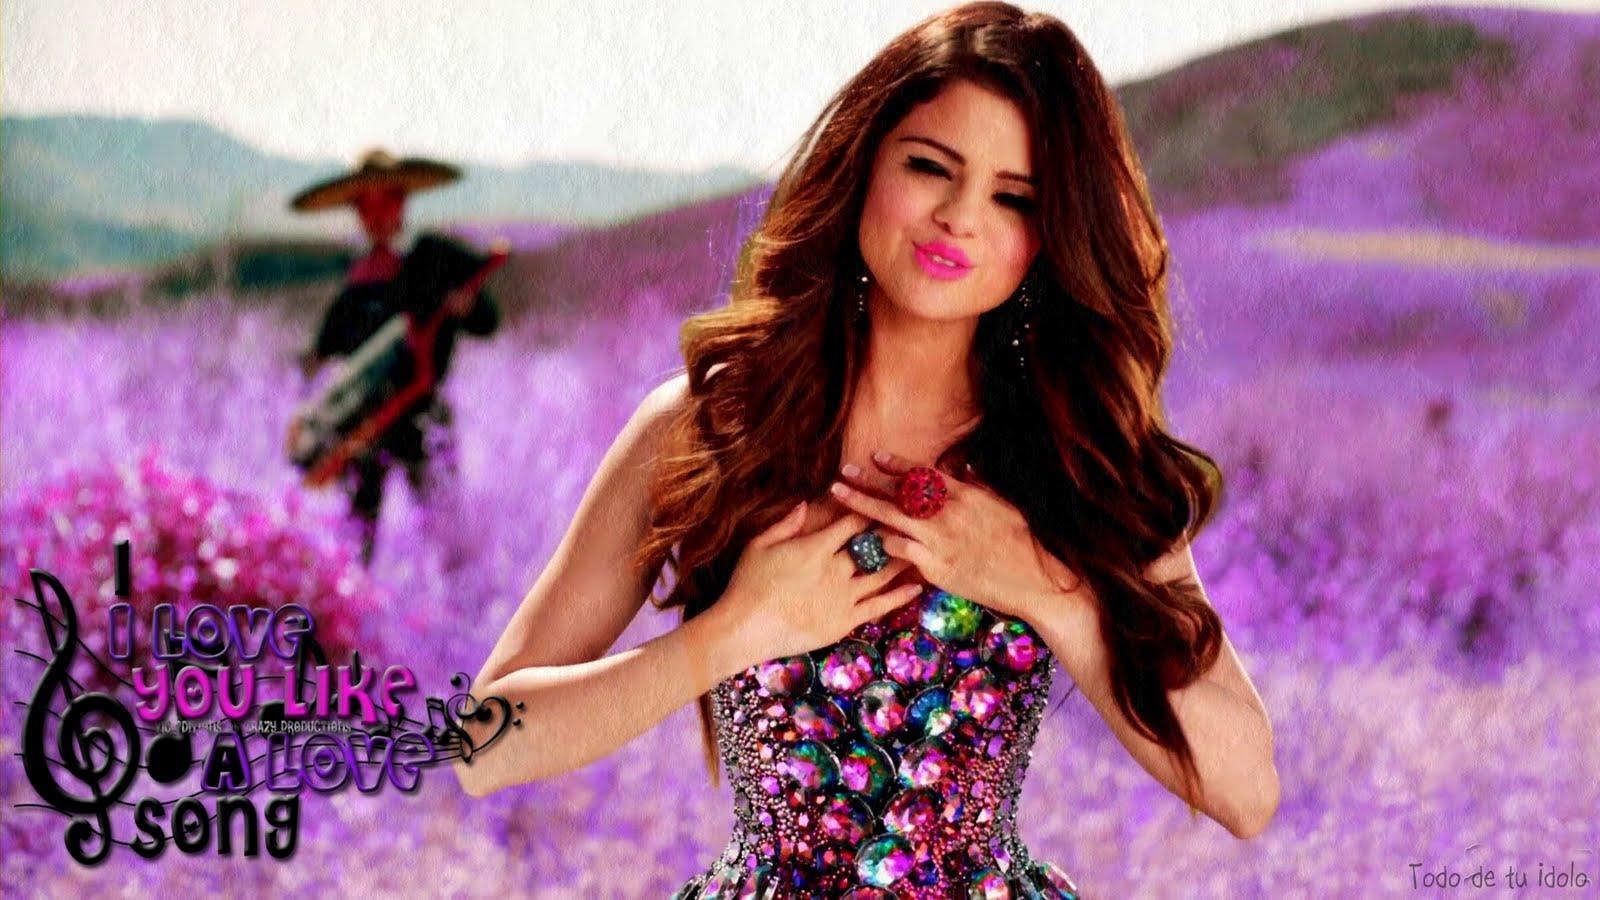 http://2.bp.blogspot.com/-WGtGHJdvOis/TlB4y7OZVjI/AAAAAAAAASI/Cw2Vd8MLmGM/s1600/Selena+Gomez+love+you+like+a+love+song+blend+by+todo+de+tu+idolo.jpg